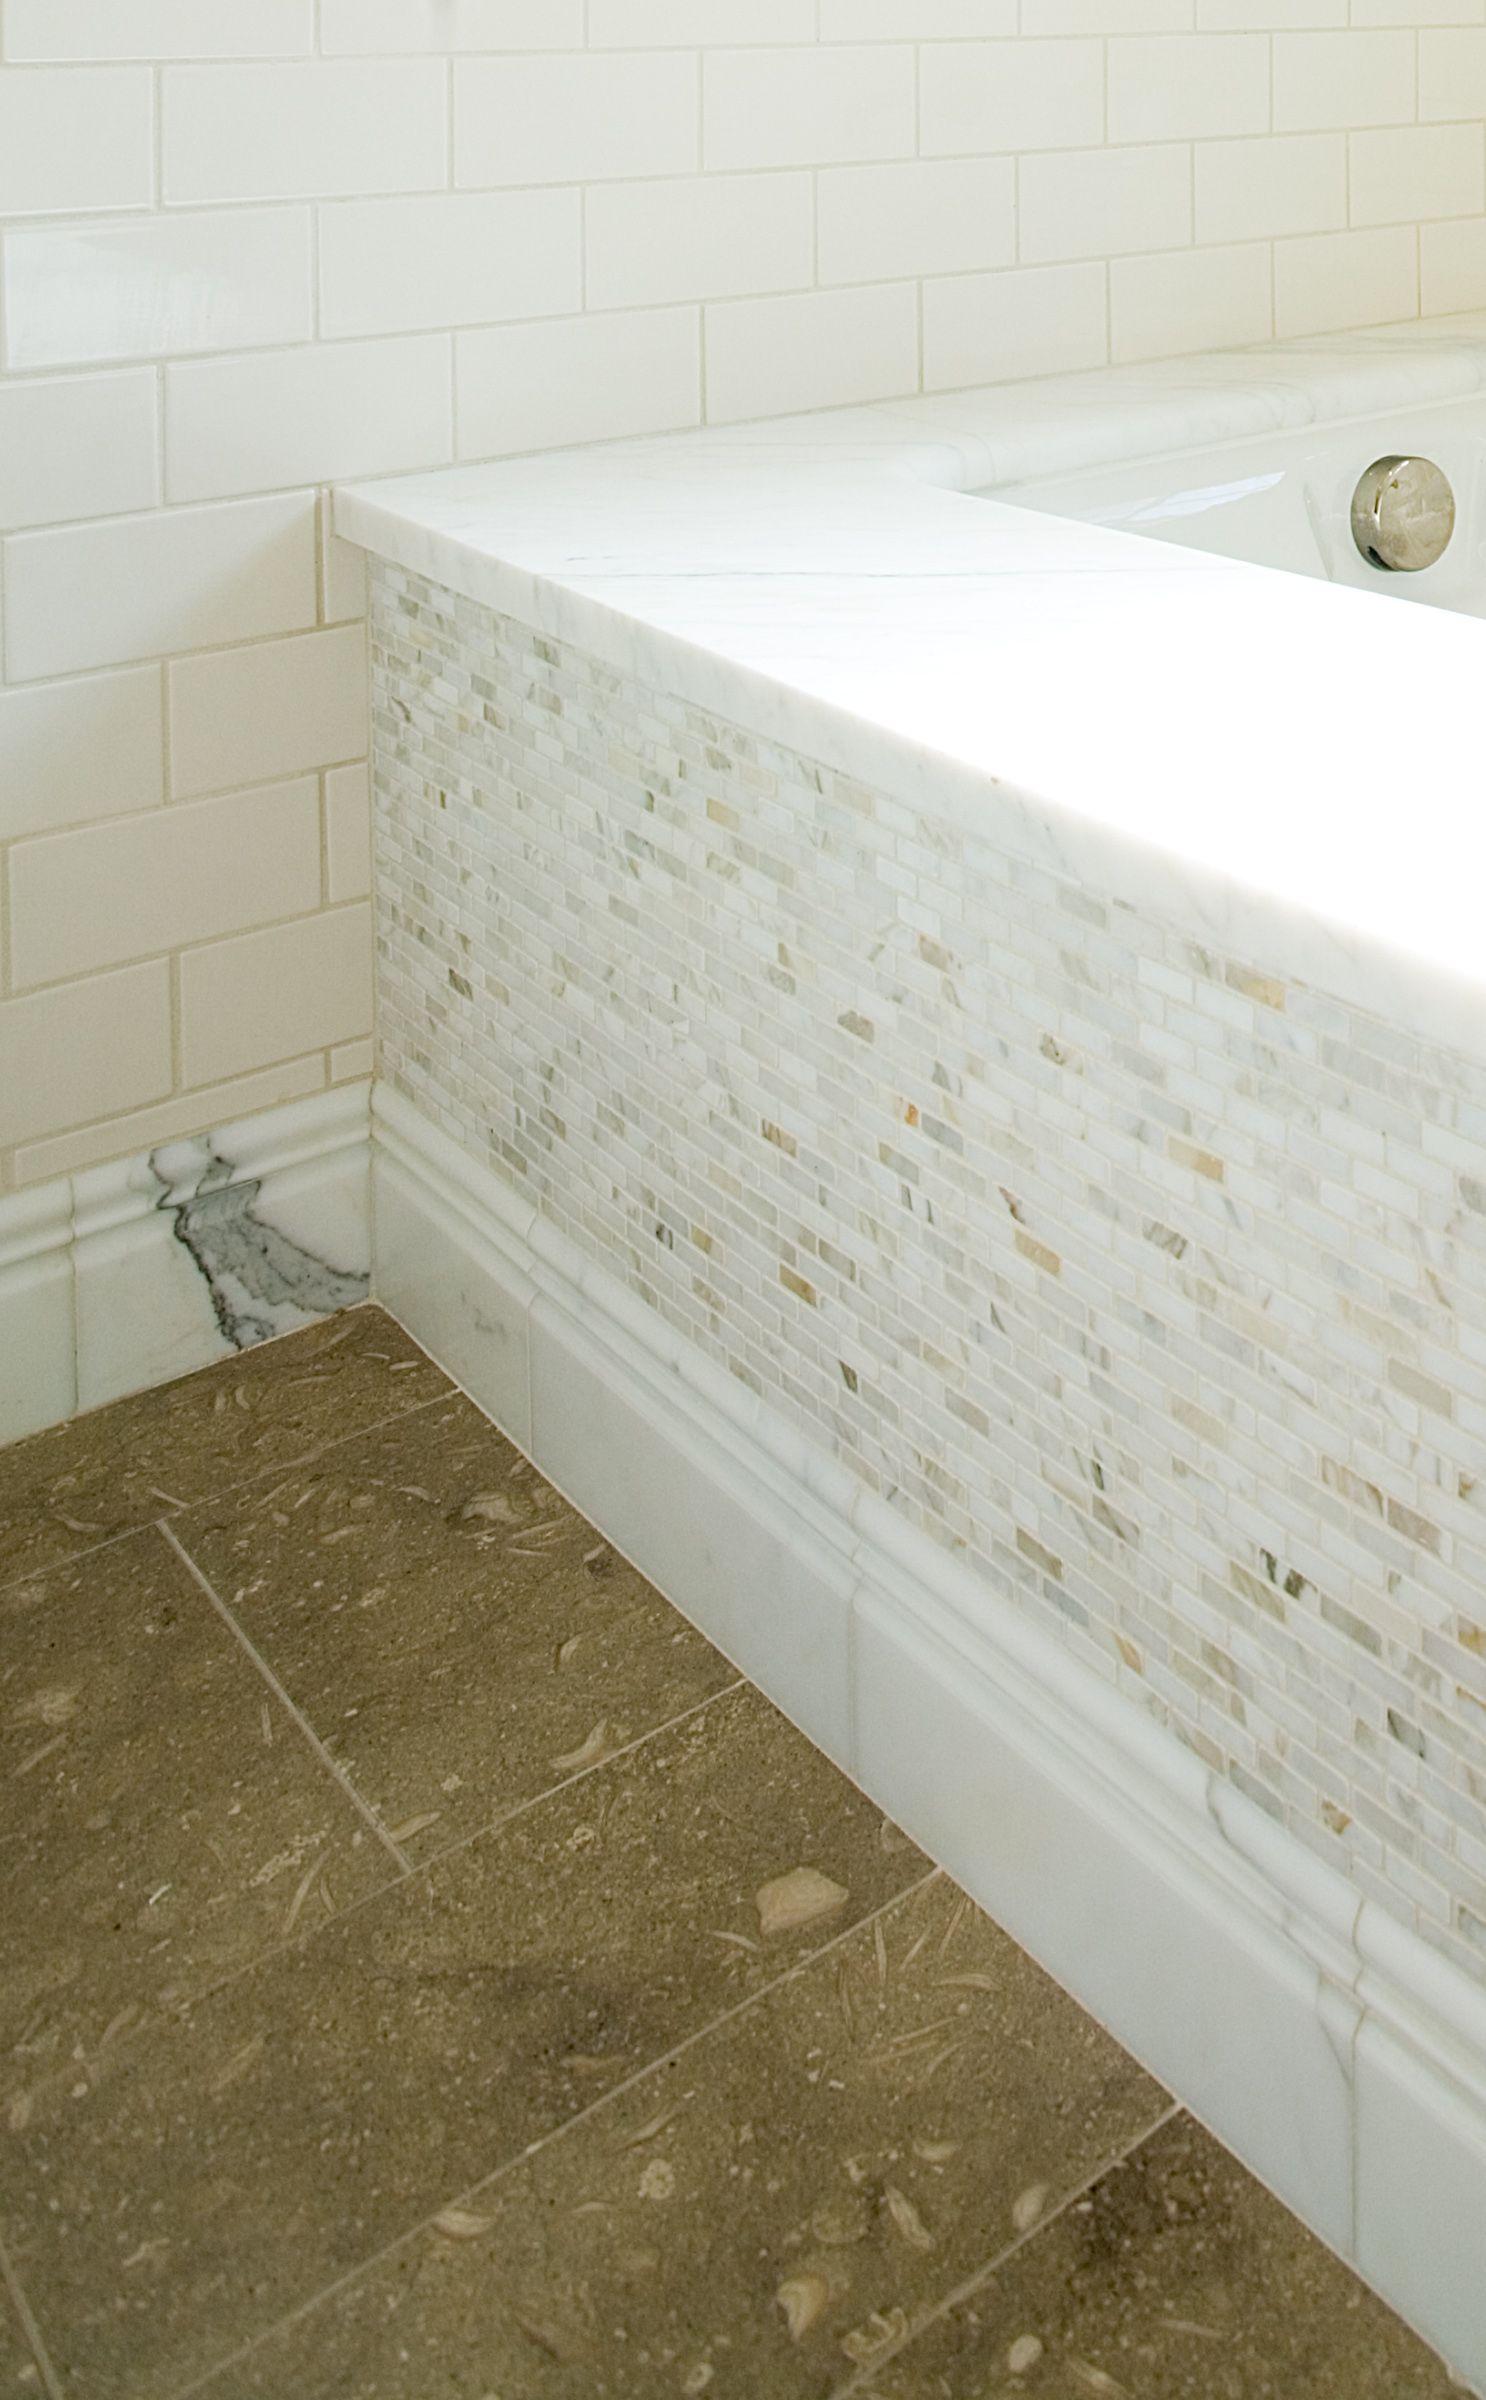 Marble Tub Riser Baseboard Seagrass Limestone Flooring Marble Bathroom Designs Marble Bathroom Baseboards